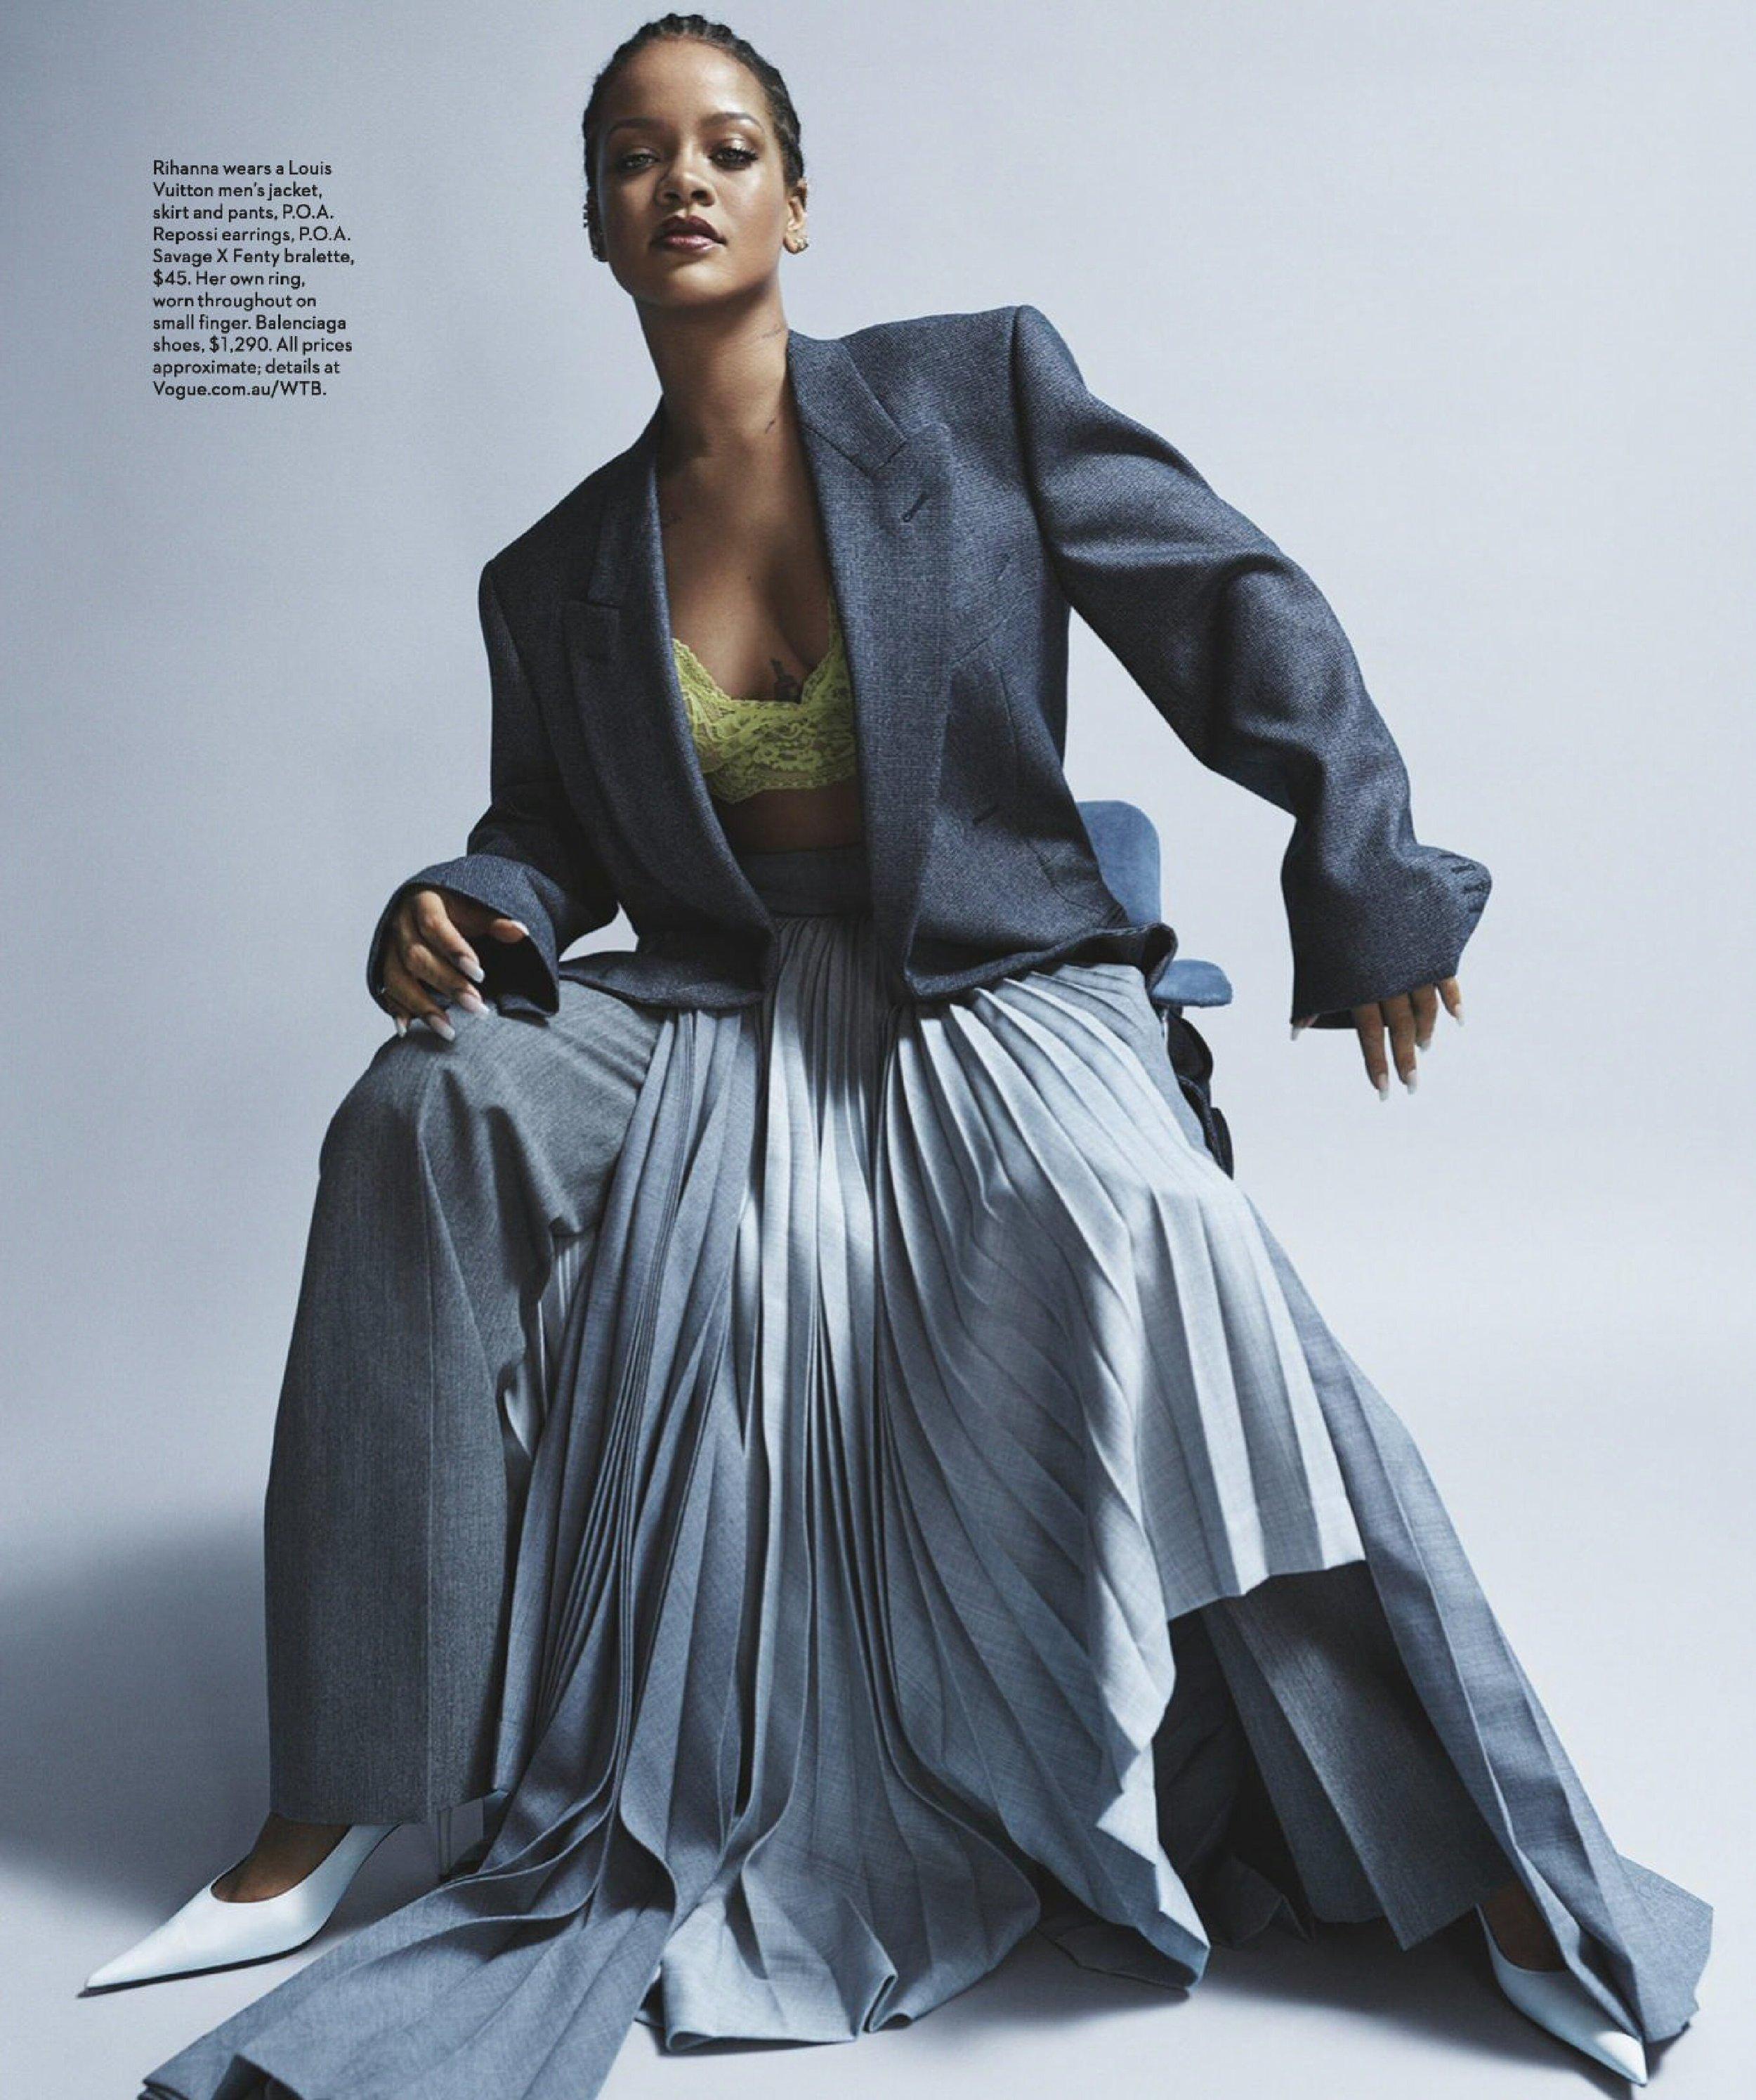 Rihanna-Josh-Olins-Vogue-Australia-May-2019- (2).jpg